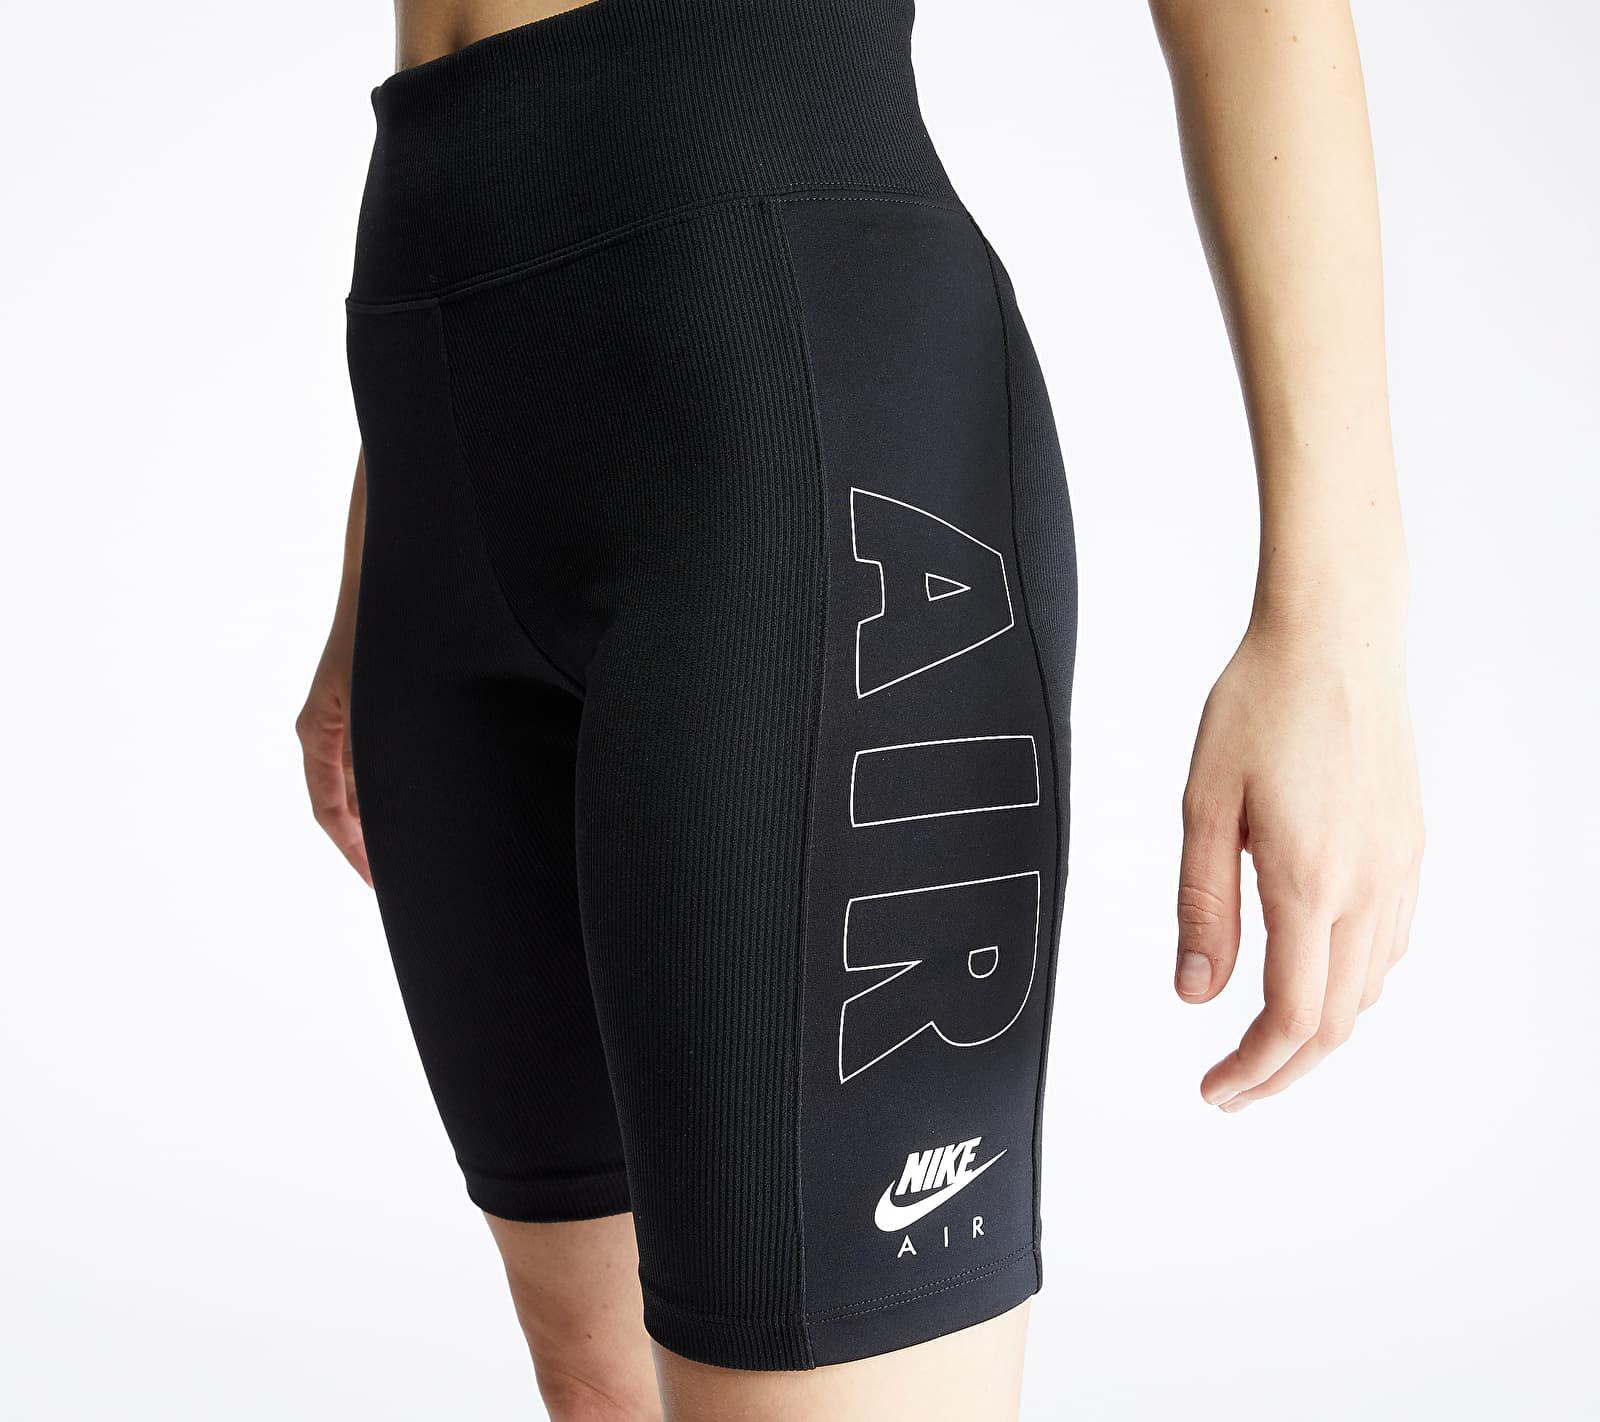 Nike Sportswear Air Bike Shorts Black